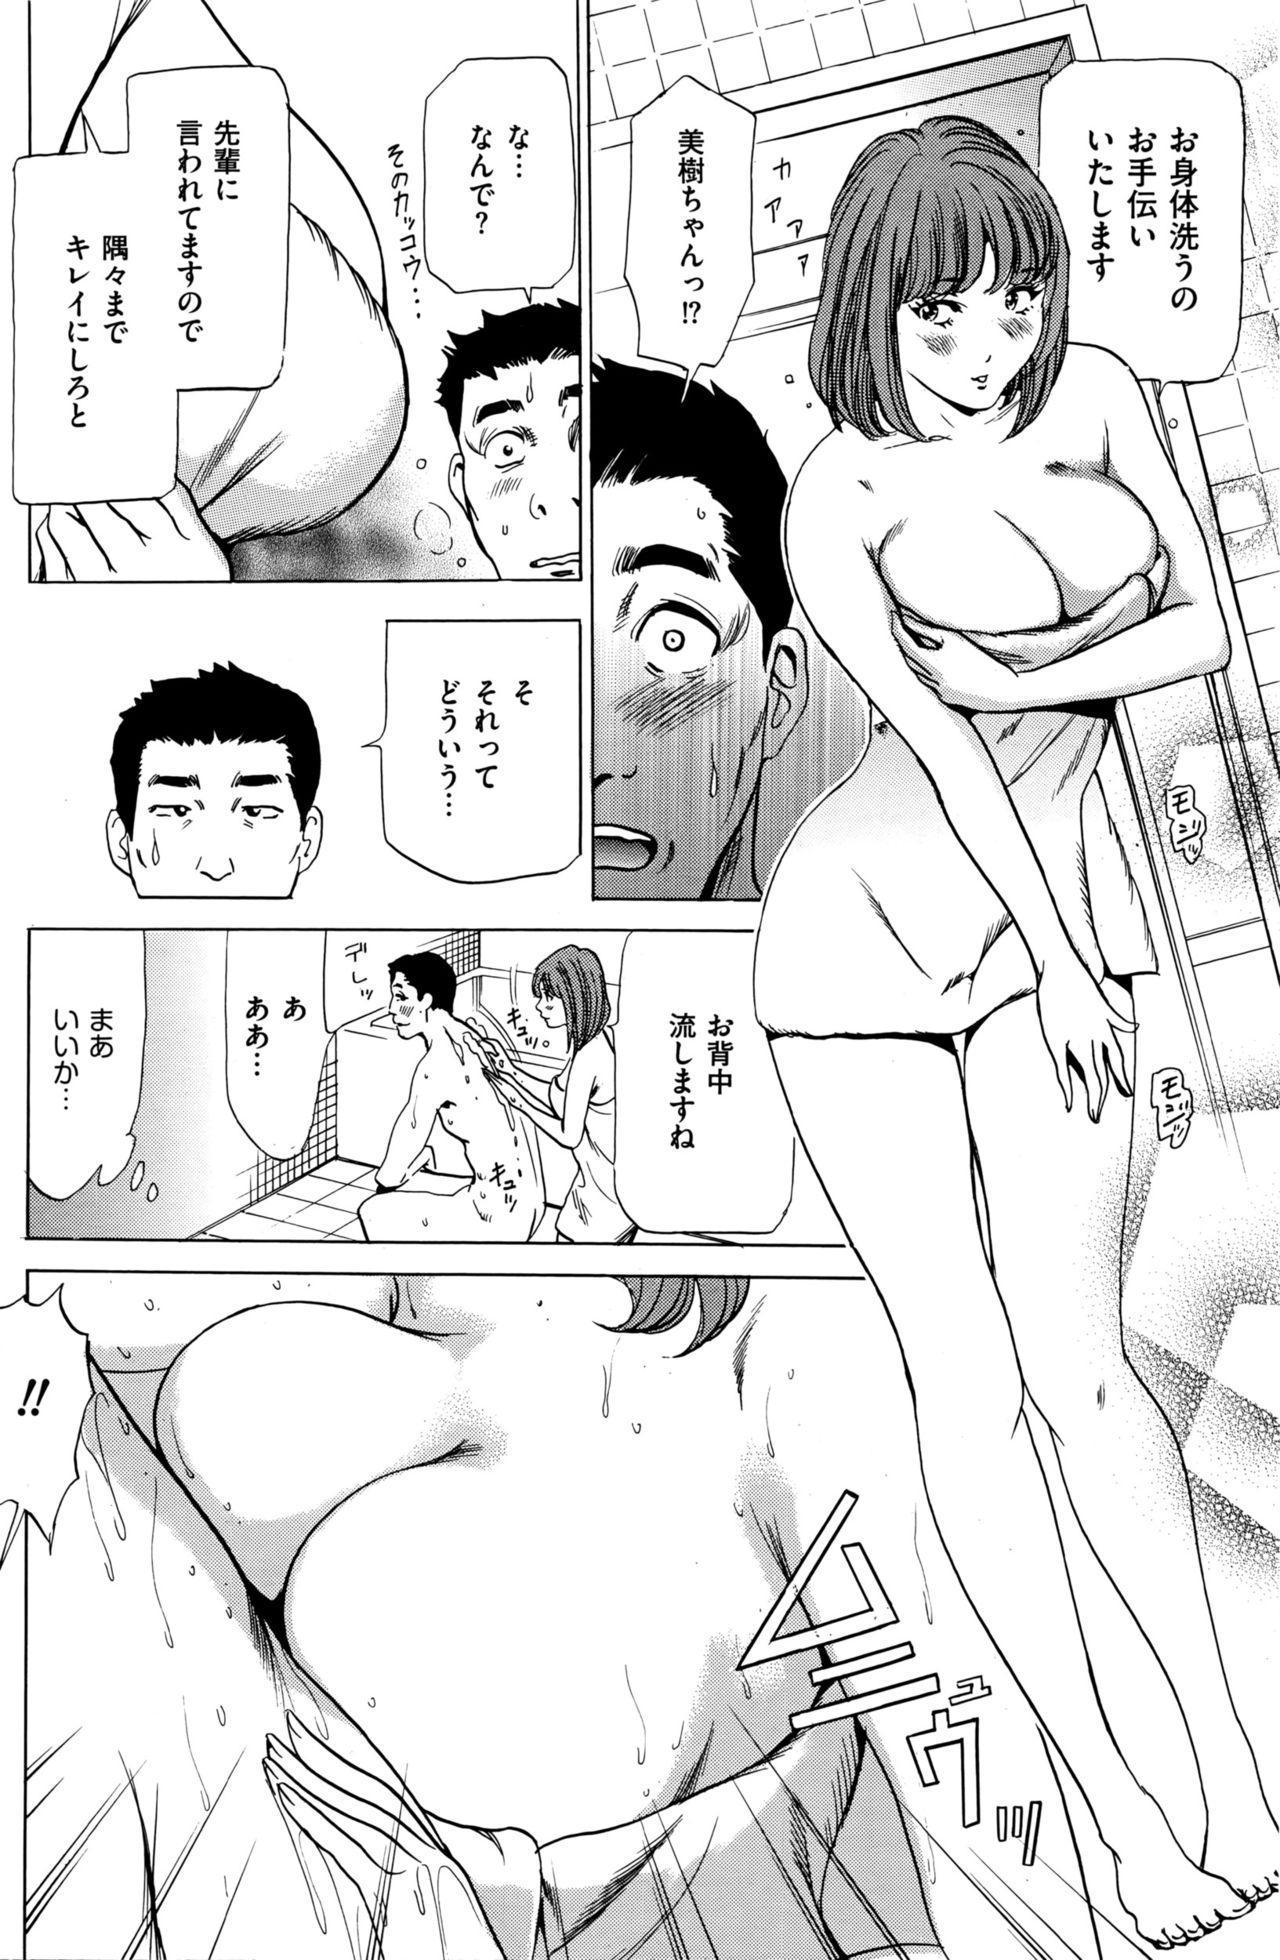 Wa Usuki Ipa a 1-10 42